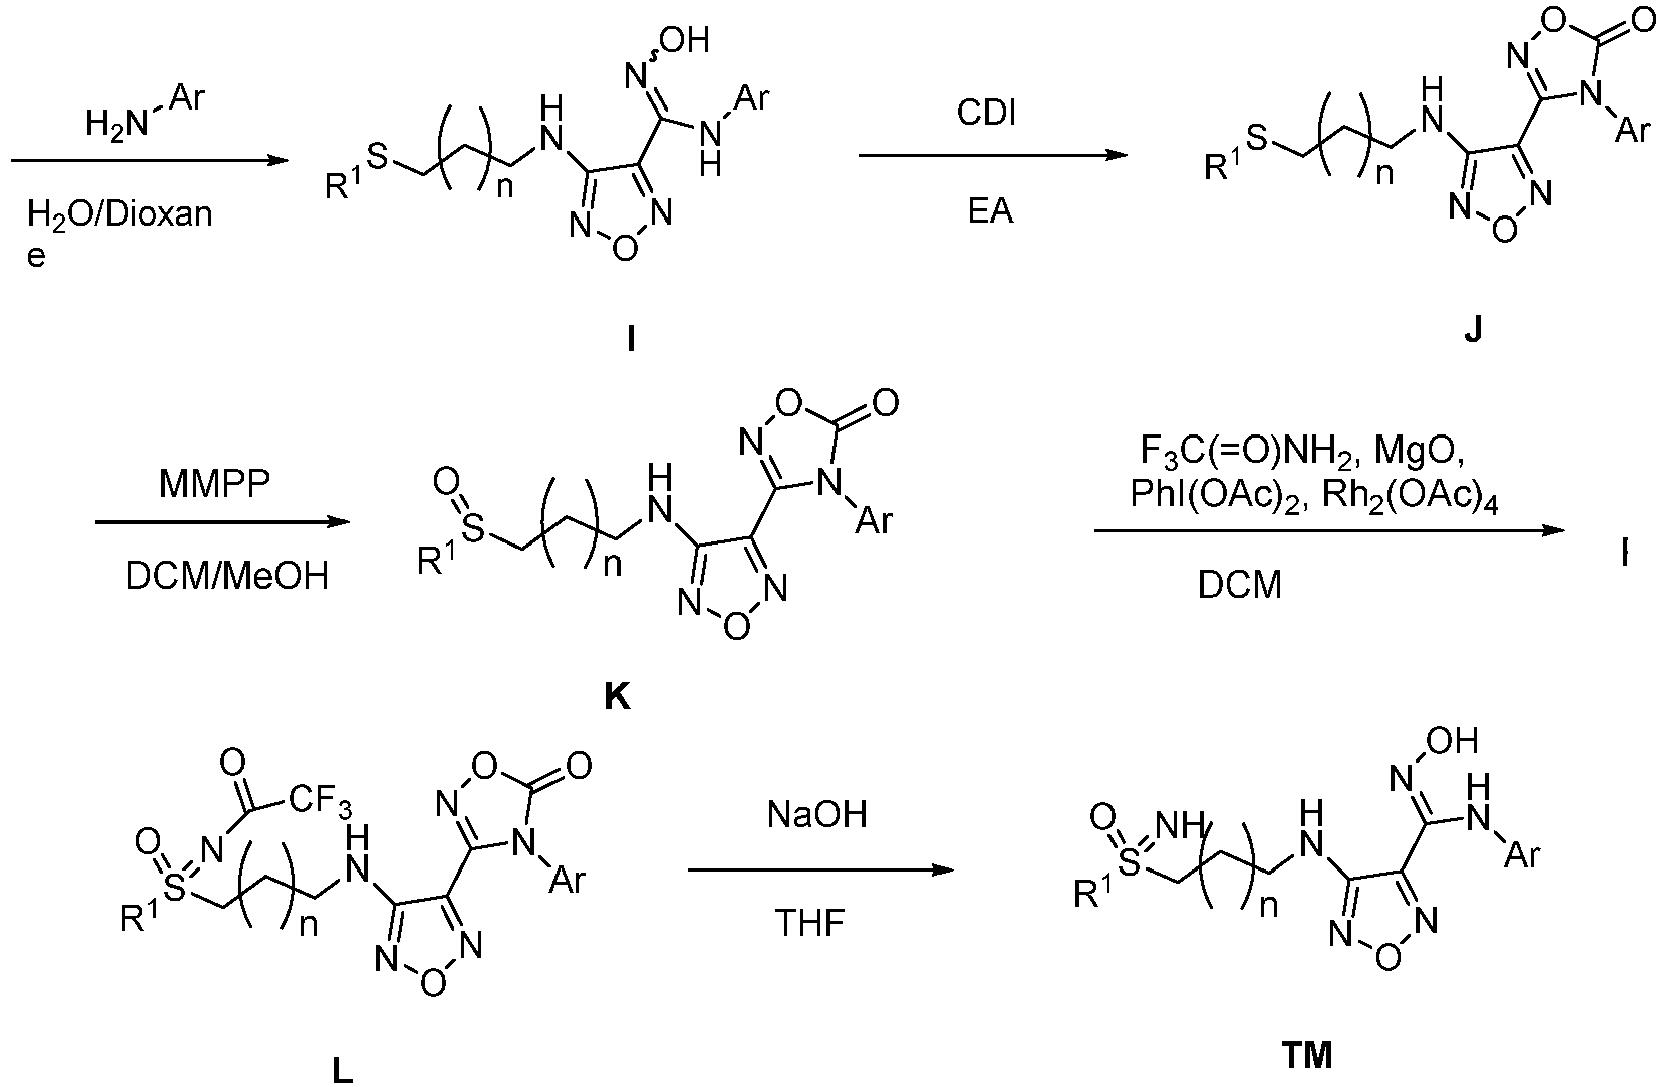 INDOLEAMINE-2,3-DIOXYGENASE INHIBITOR AND PREPARATION METHOD